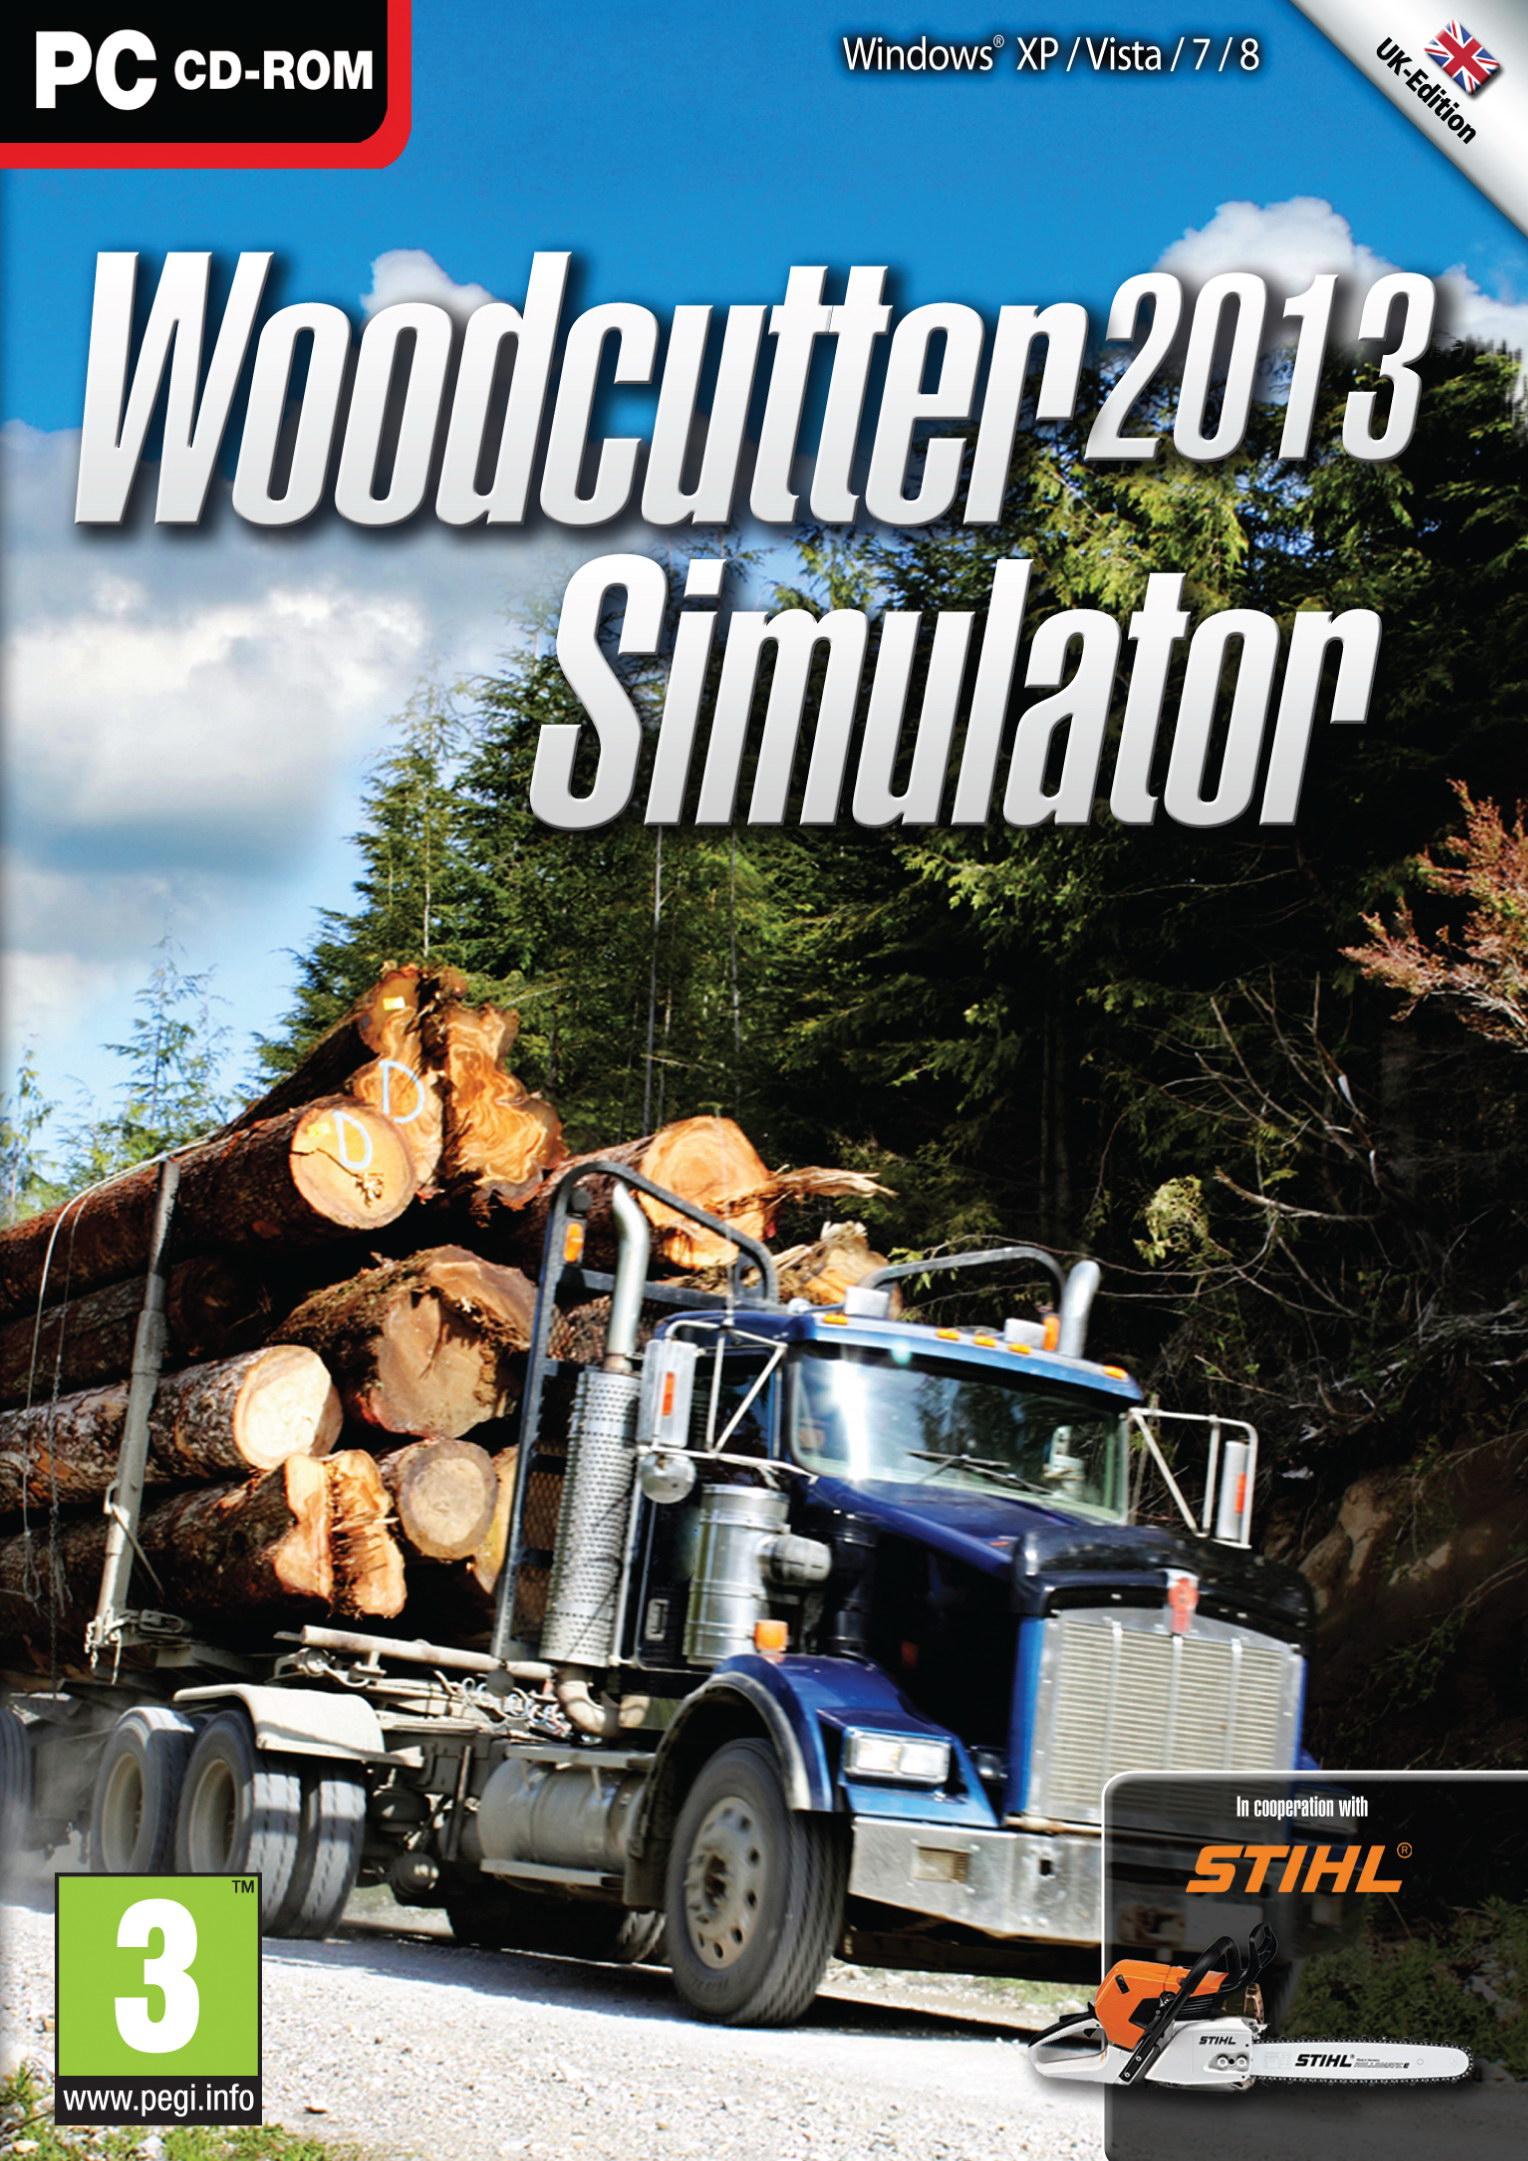 WoodcutterSim2013_ENfinal